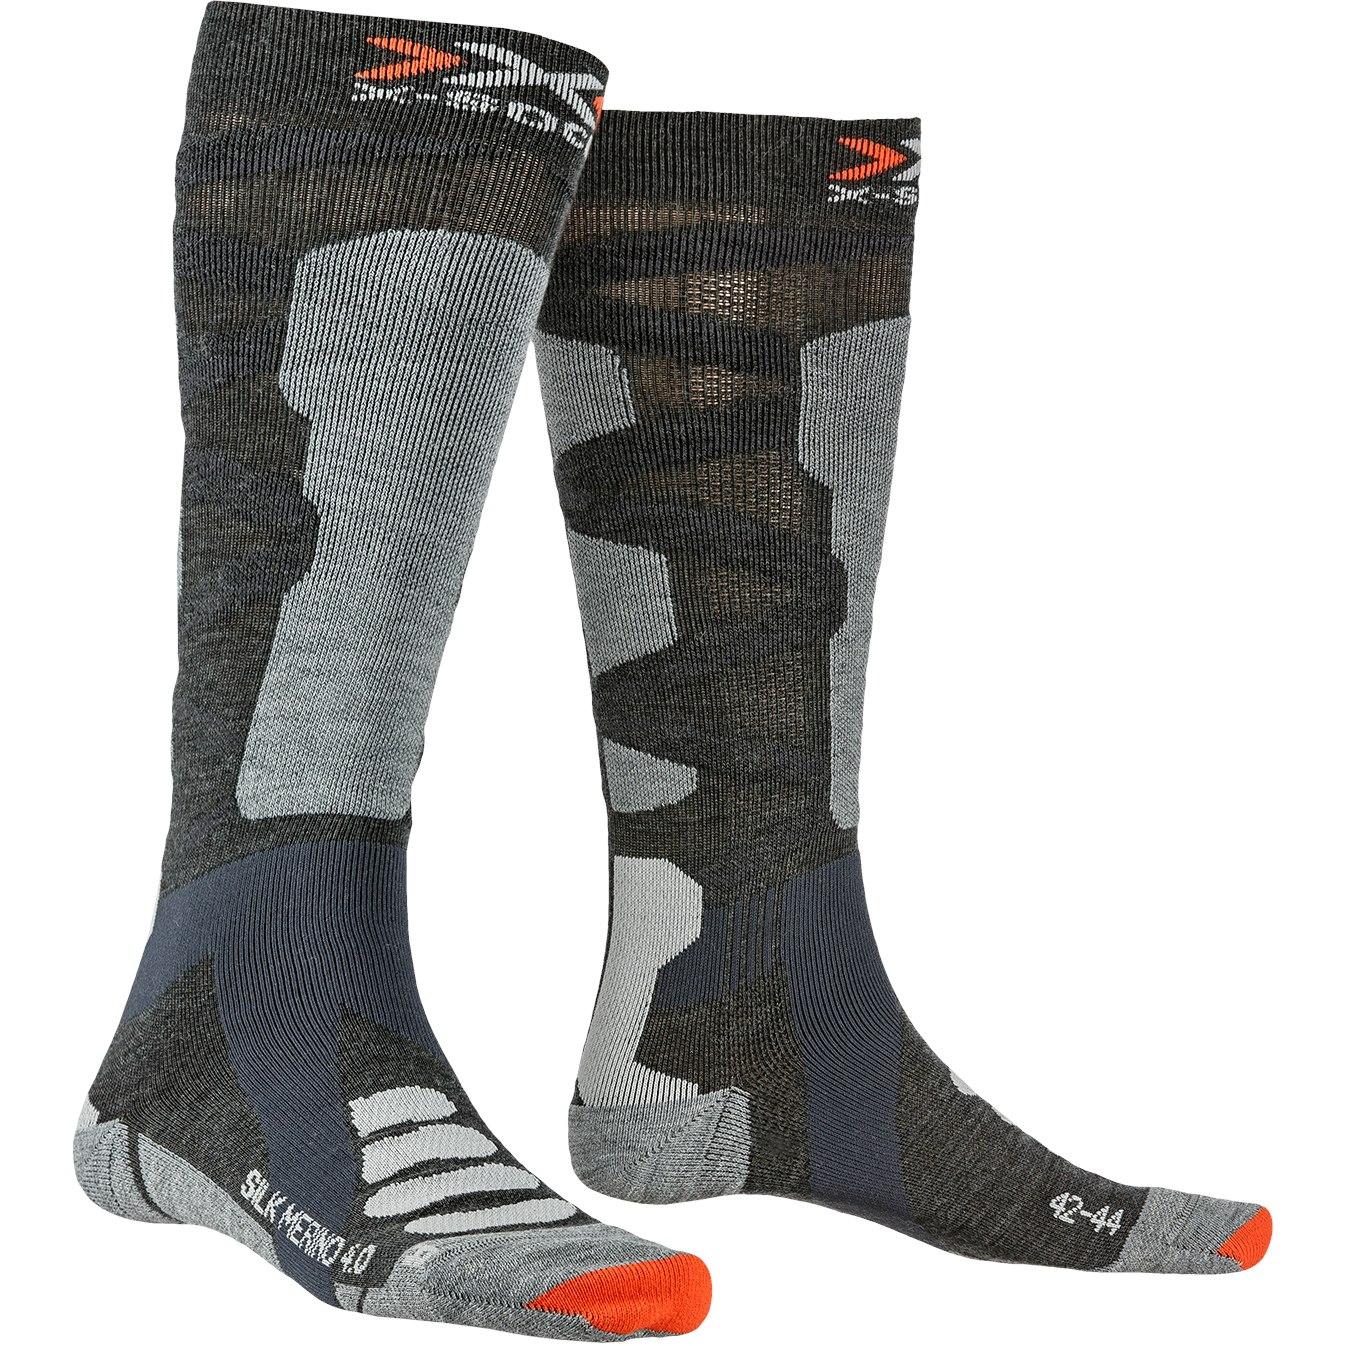 X-Socks Ski Silk Merino 4.0 Socken - anthracite melange/grey melange